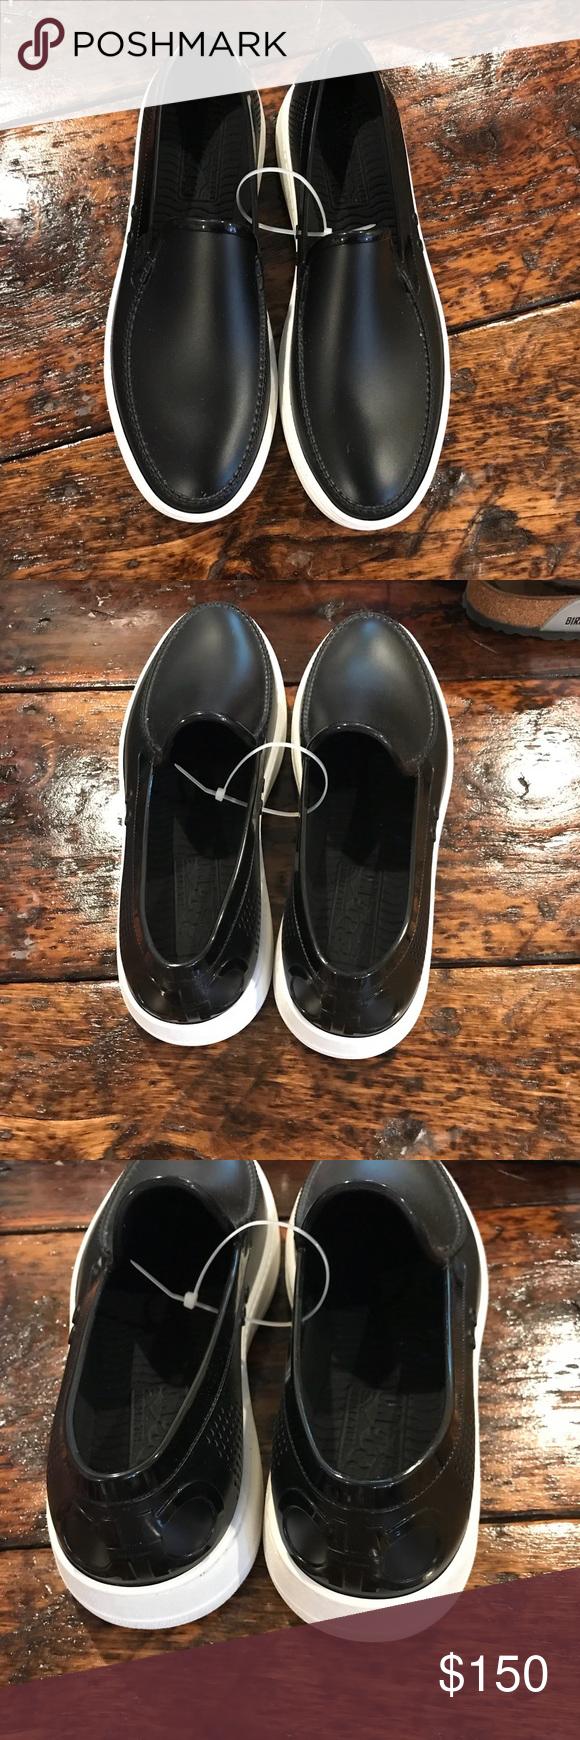 Salvatore ferragamo, Ferragamo shoes